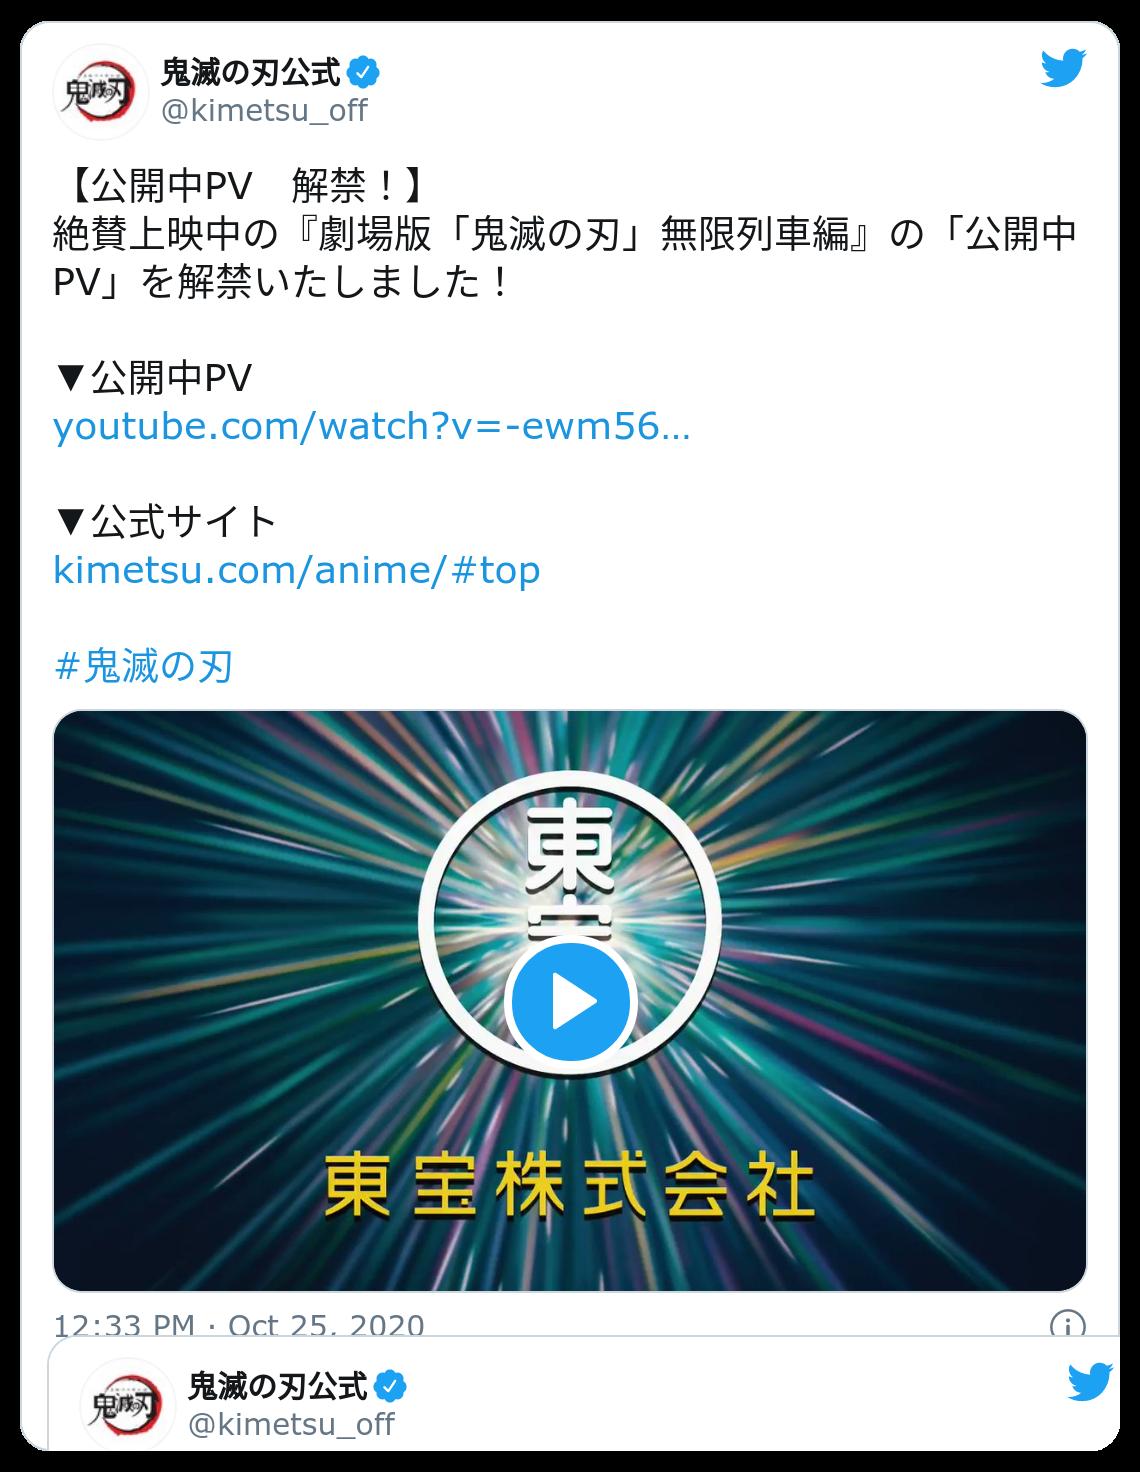 Movie KNY - Twitter